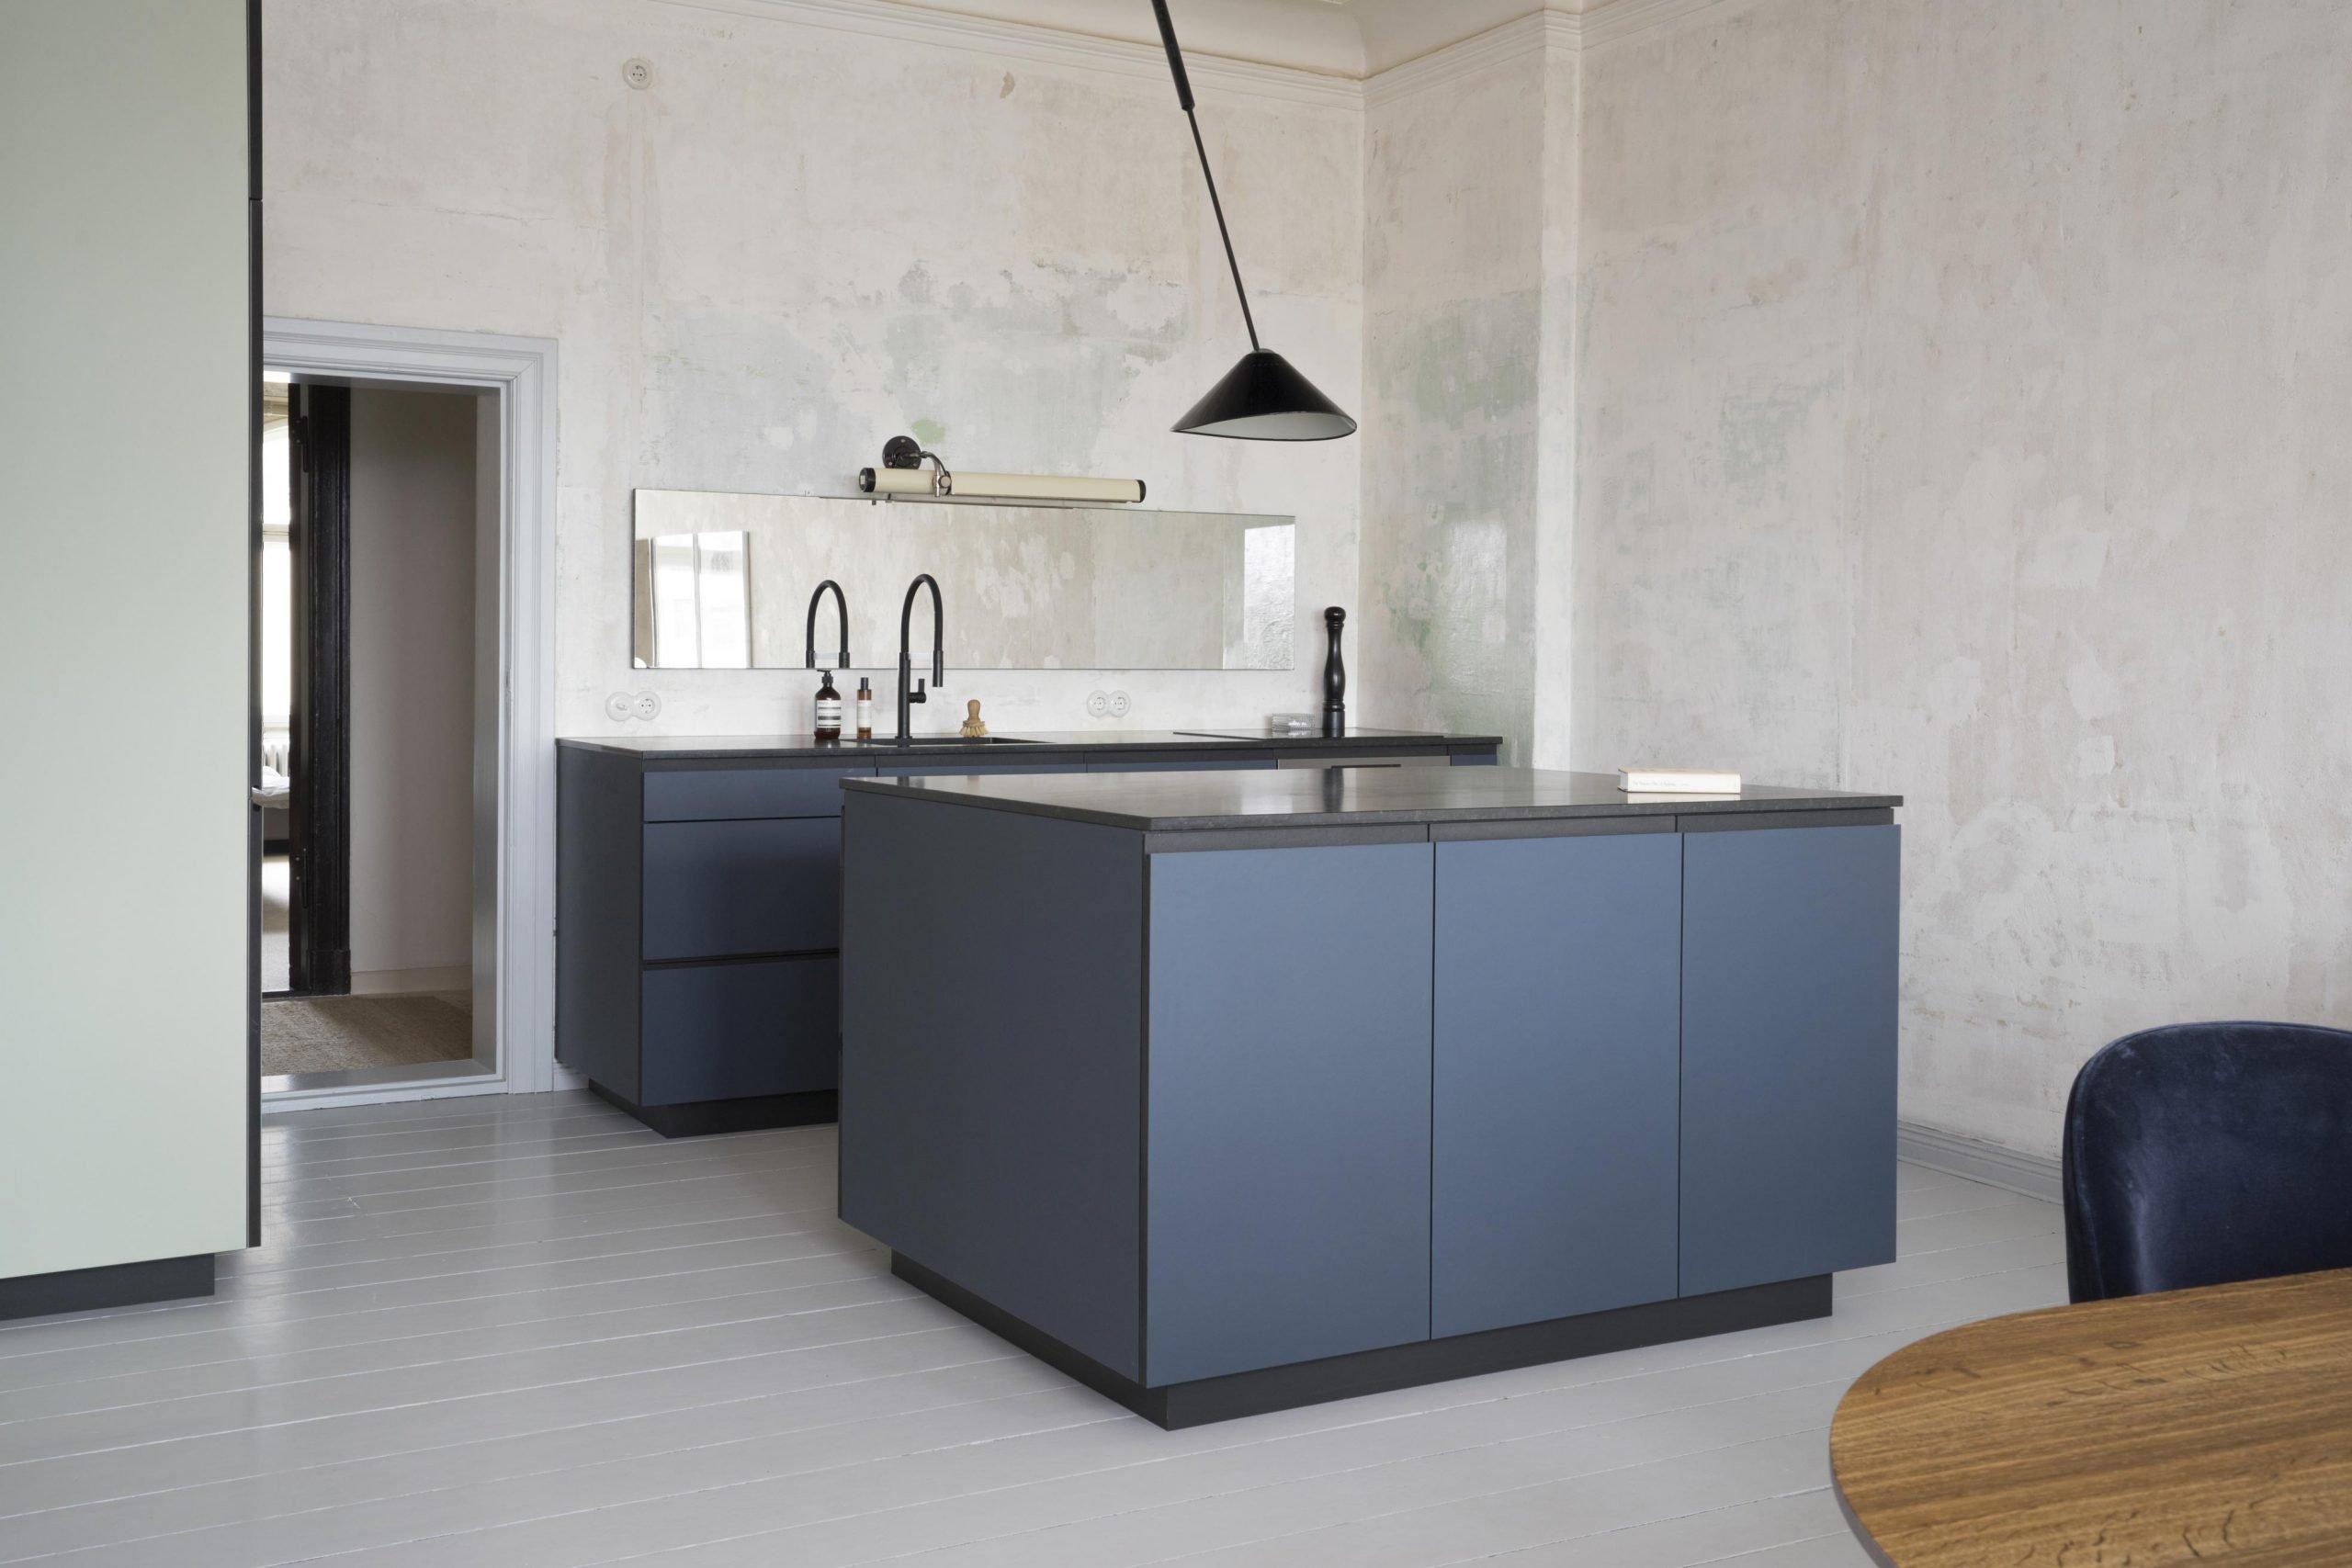 NW Küche